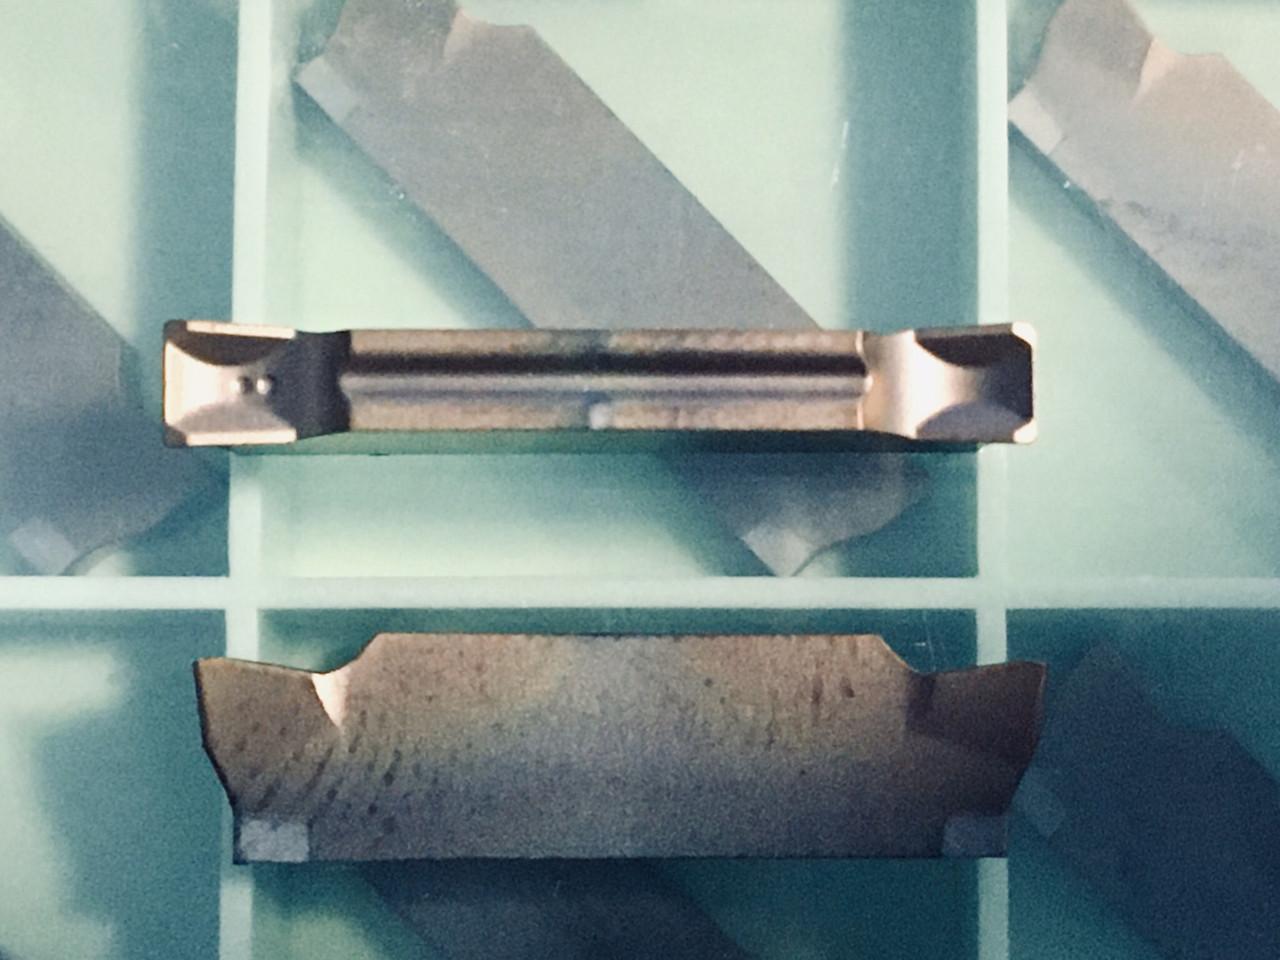 MGMN200-H P6205 Prospect Твердосплавная пластина для токарного резца